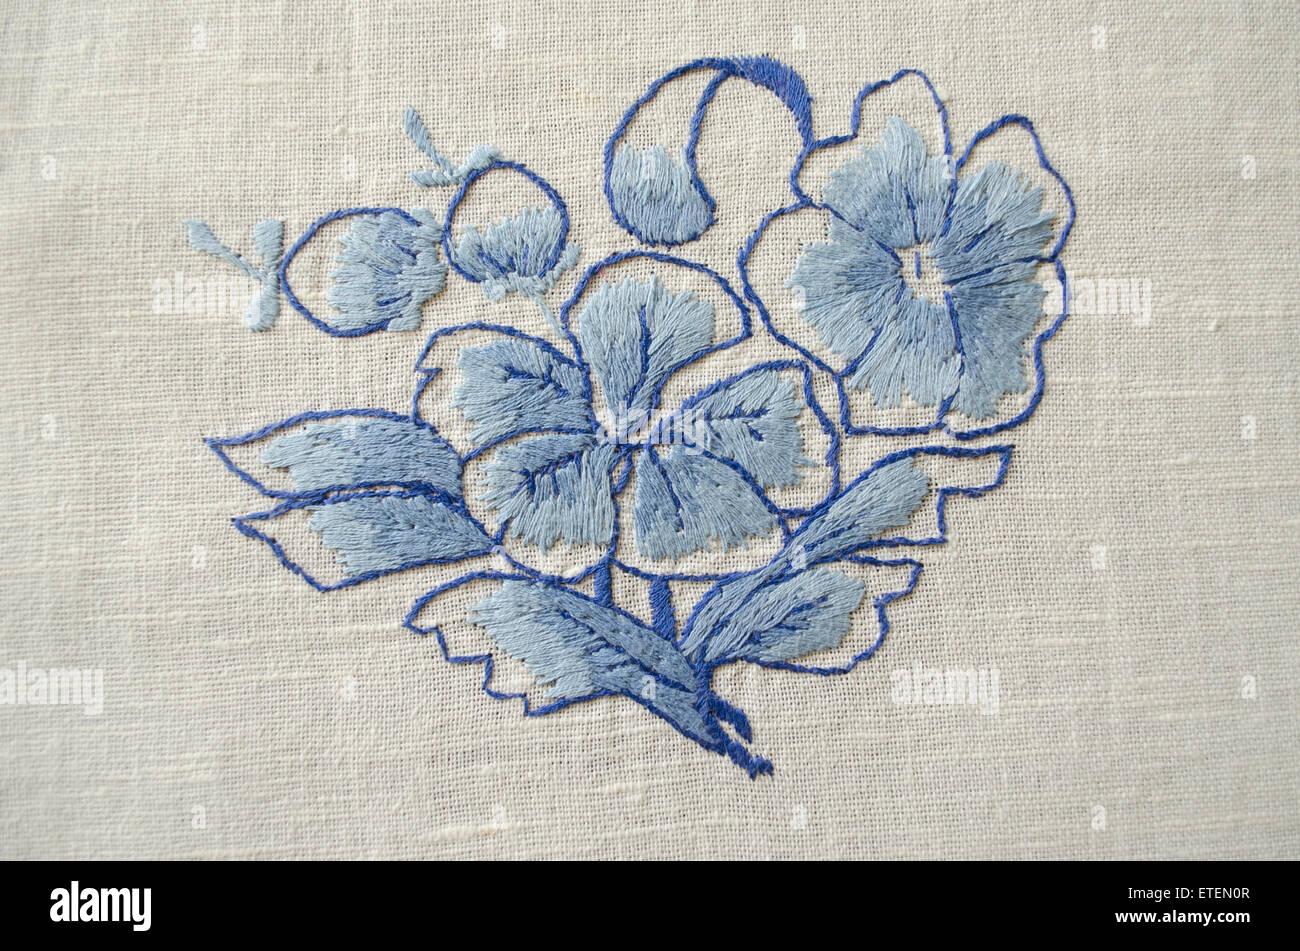 Embroidered satin stitch blue floweron cotton cloth - Stock Image